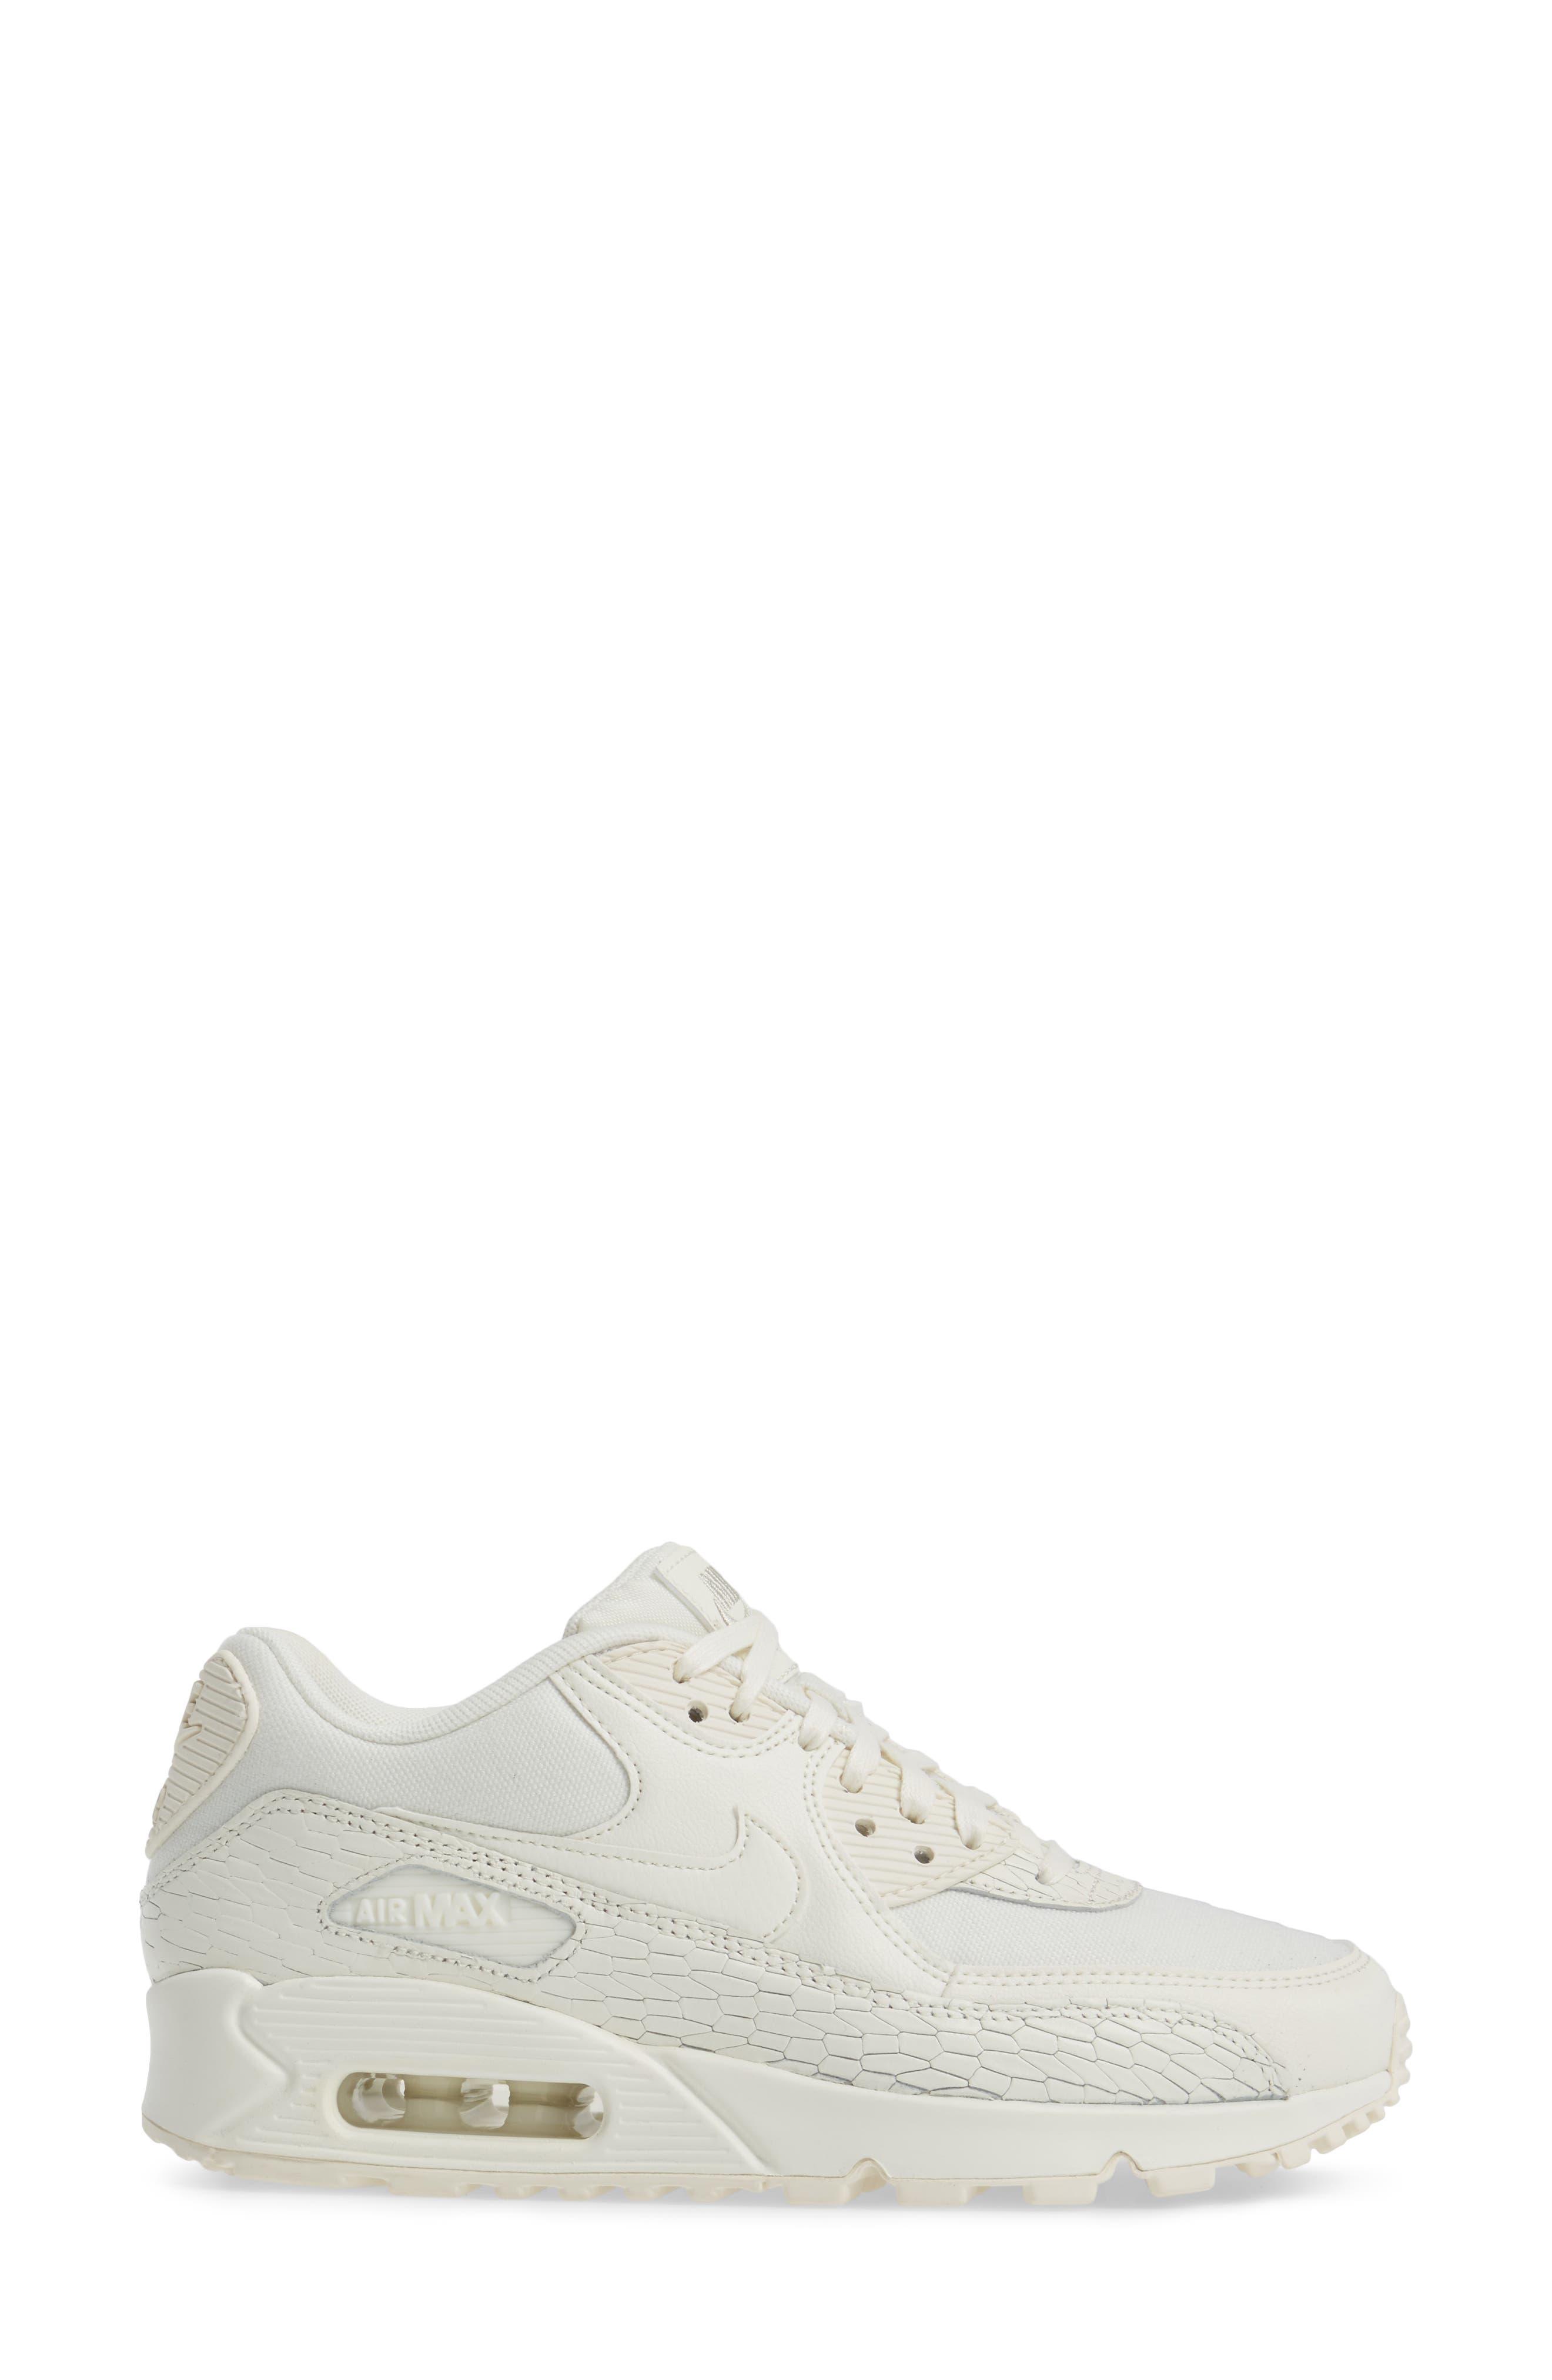 Air Max 90 Premium Leather Sneaker,                             Alternate thumbnail 3, color,                             250